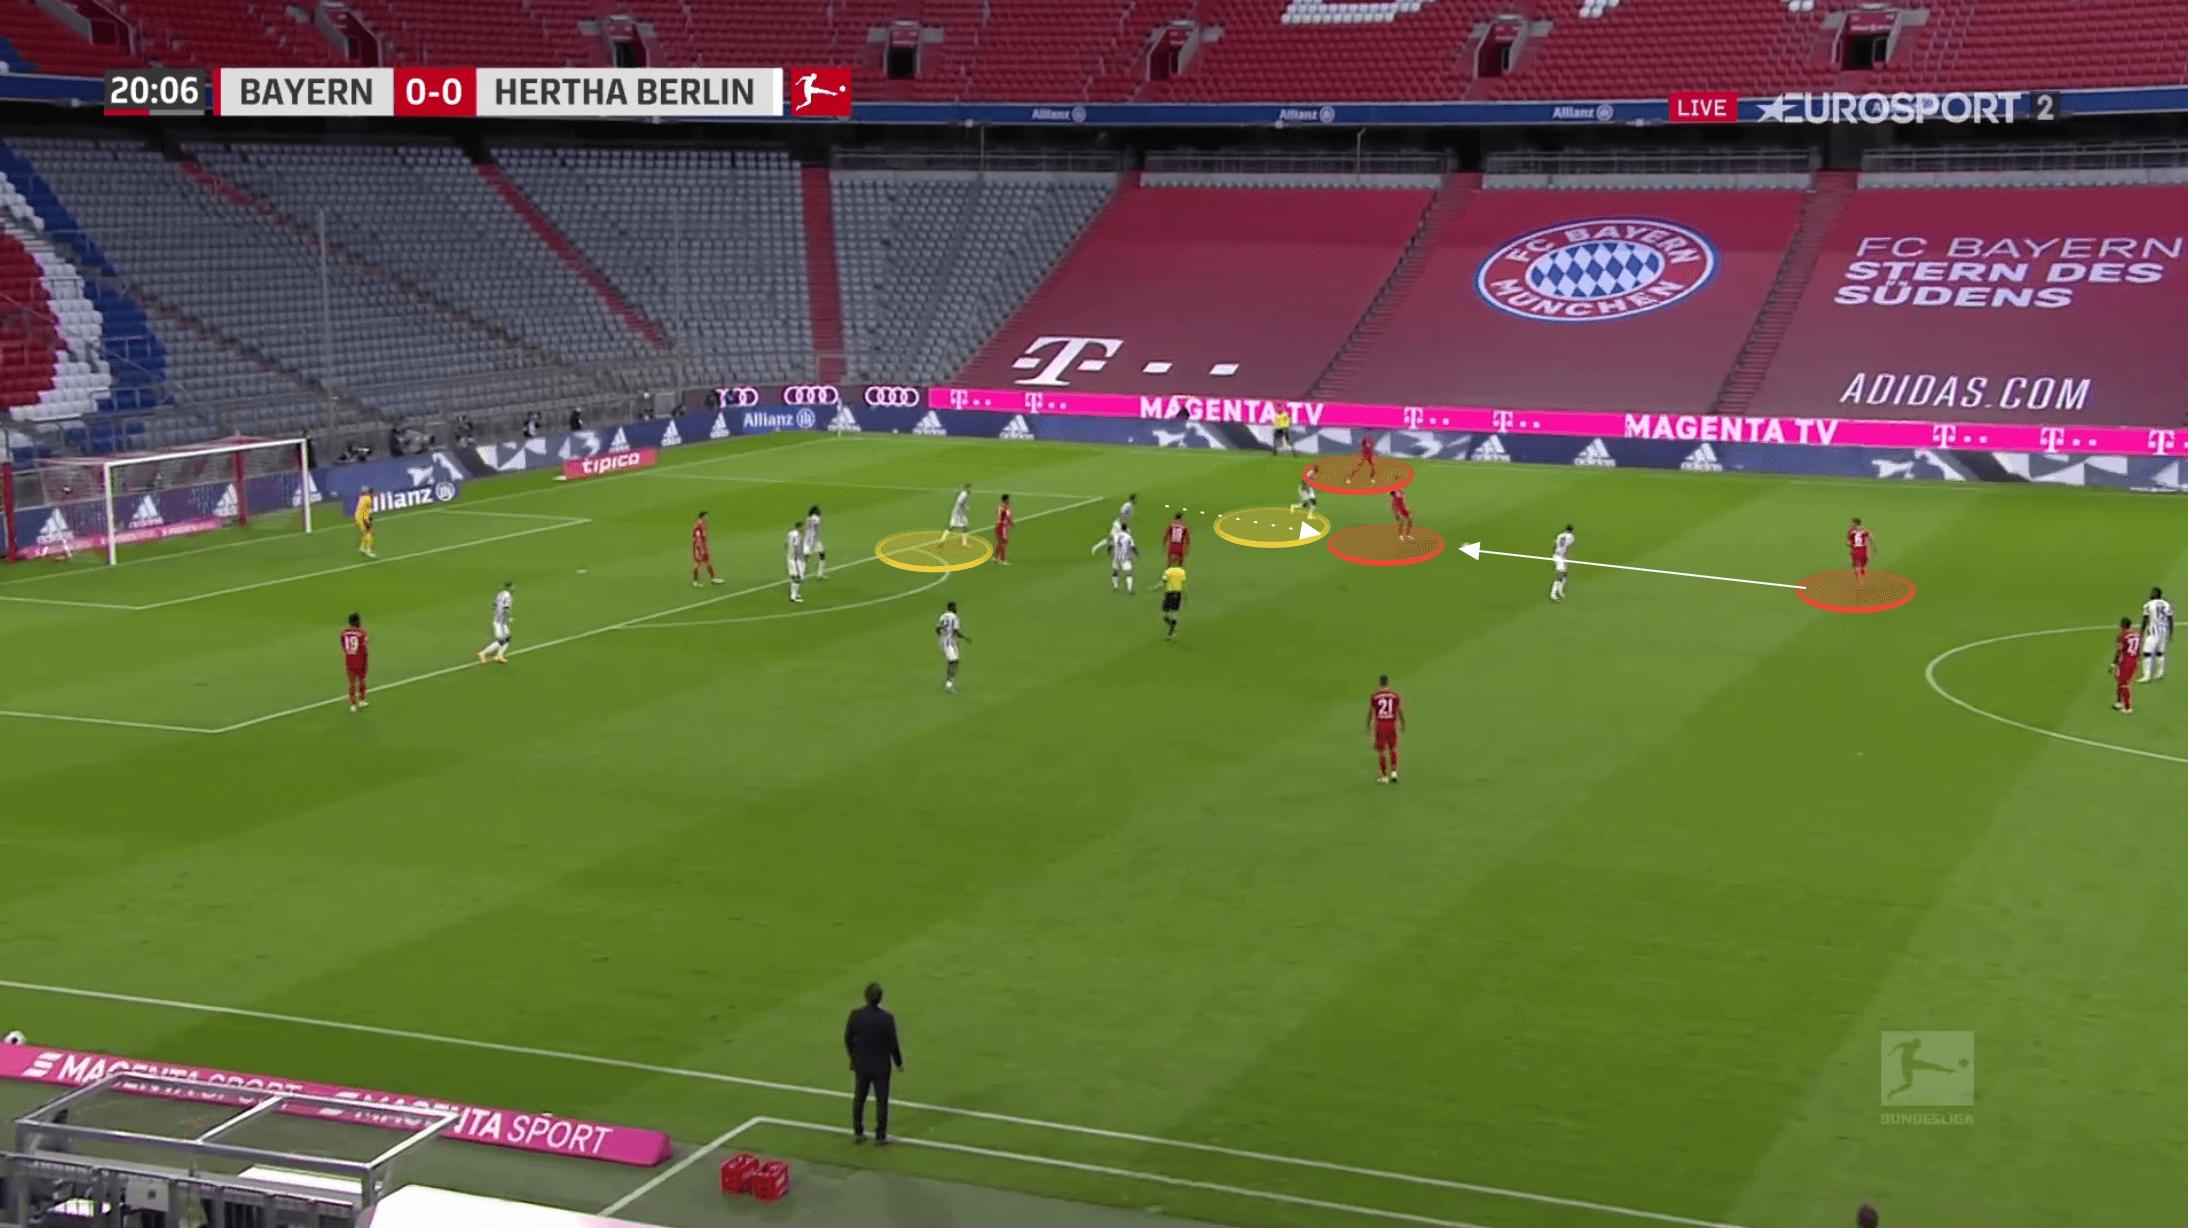 Bundesliga 2020/21: Bayern Munich vs Hertha BSC - tactical analysis tactics